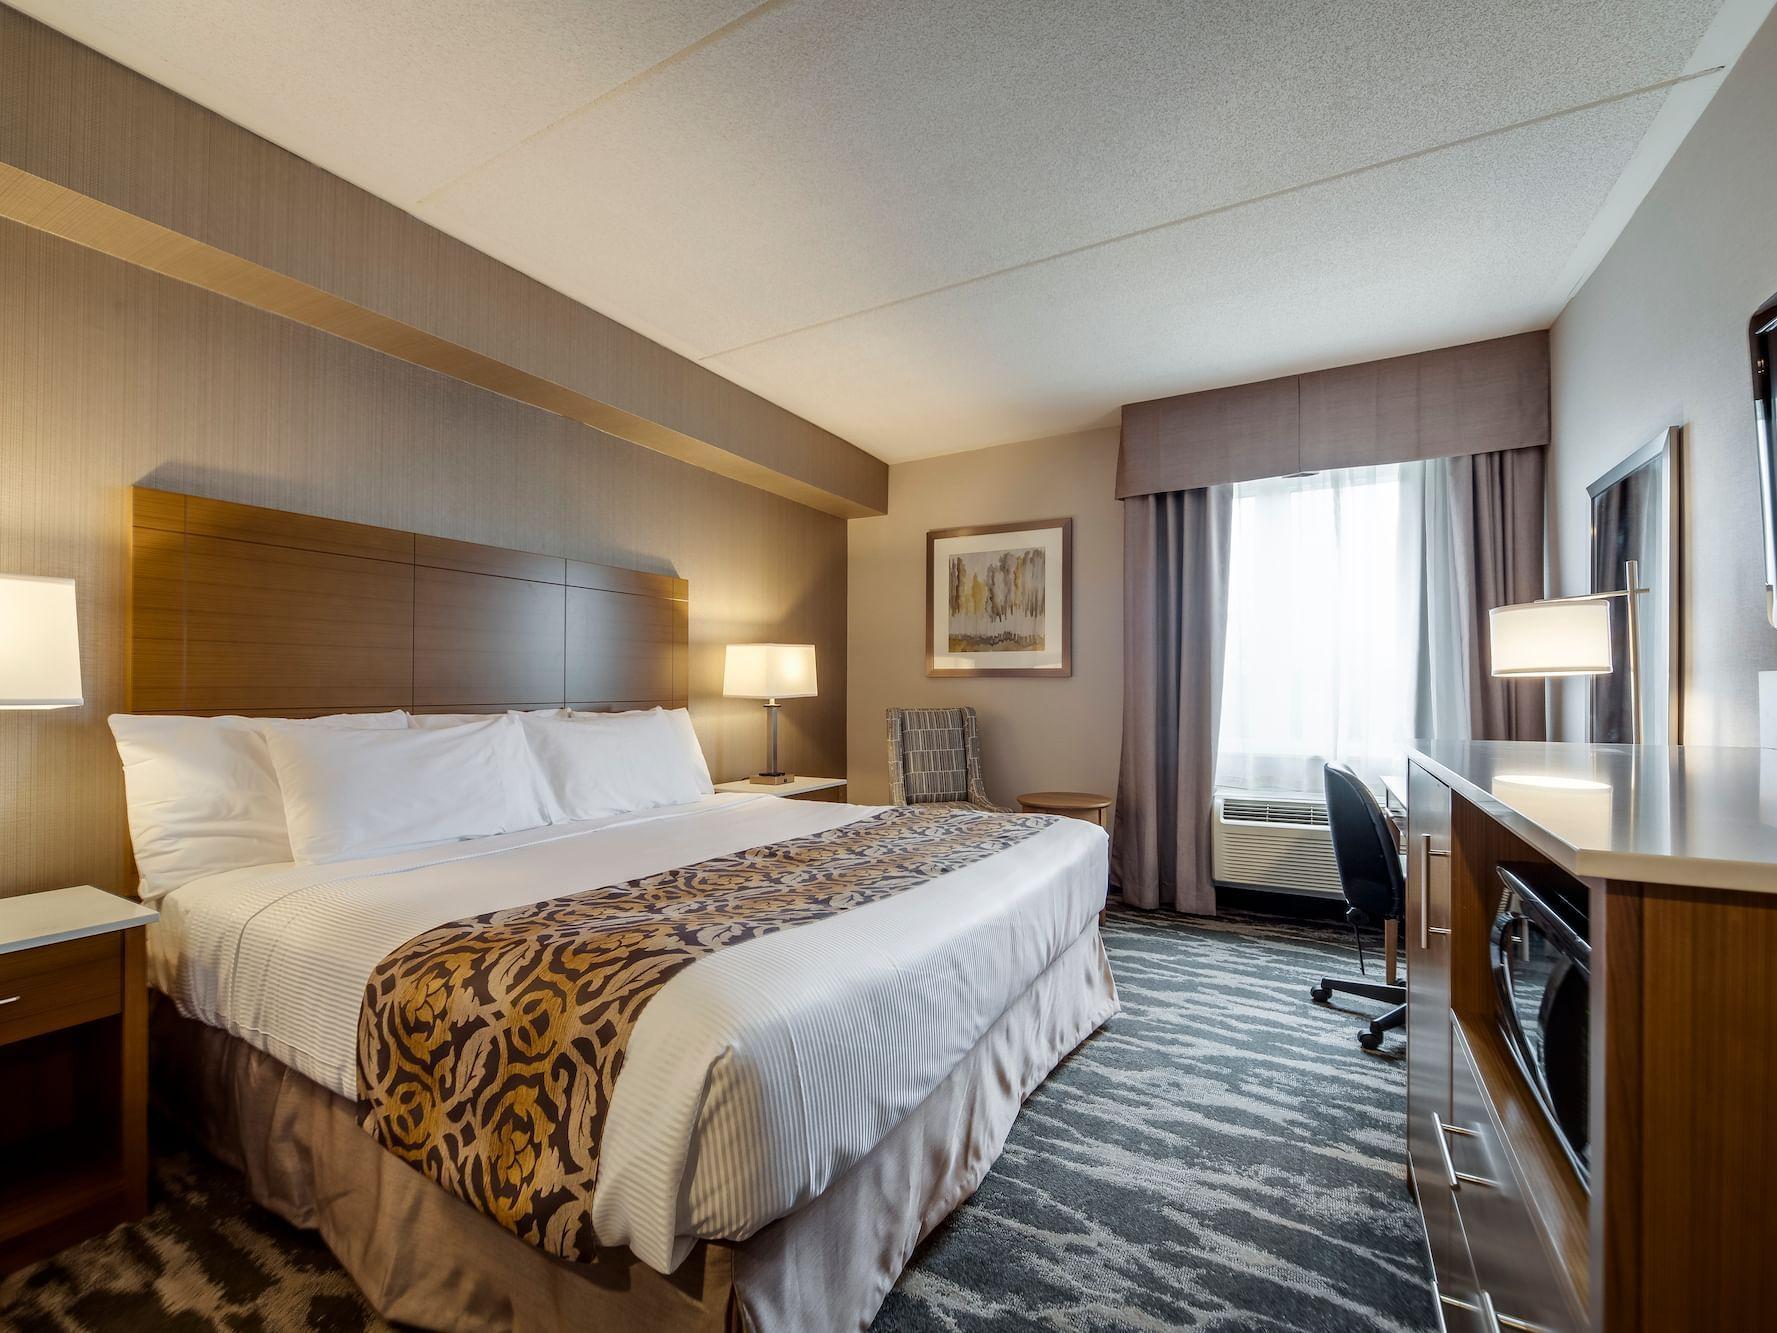 Monte Carlo Inn One Queen Bed